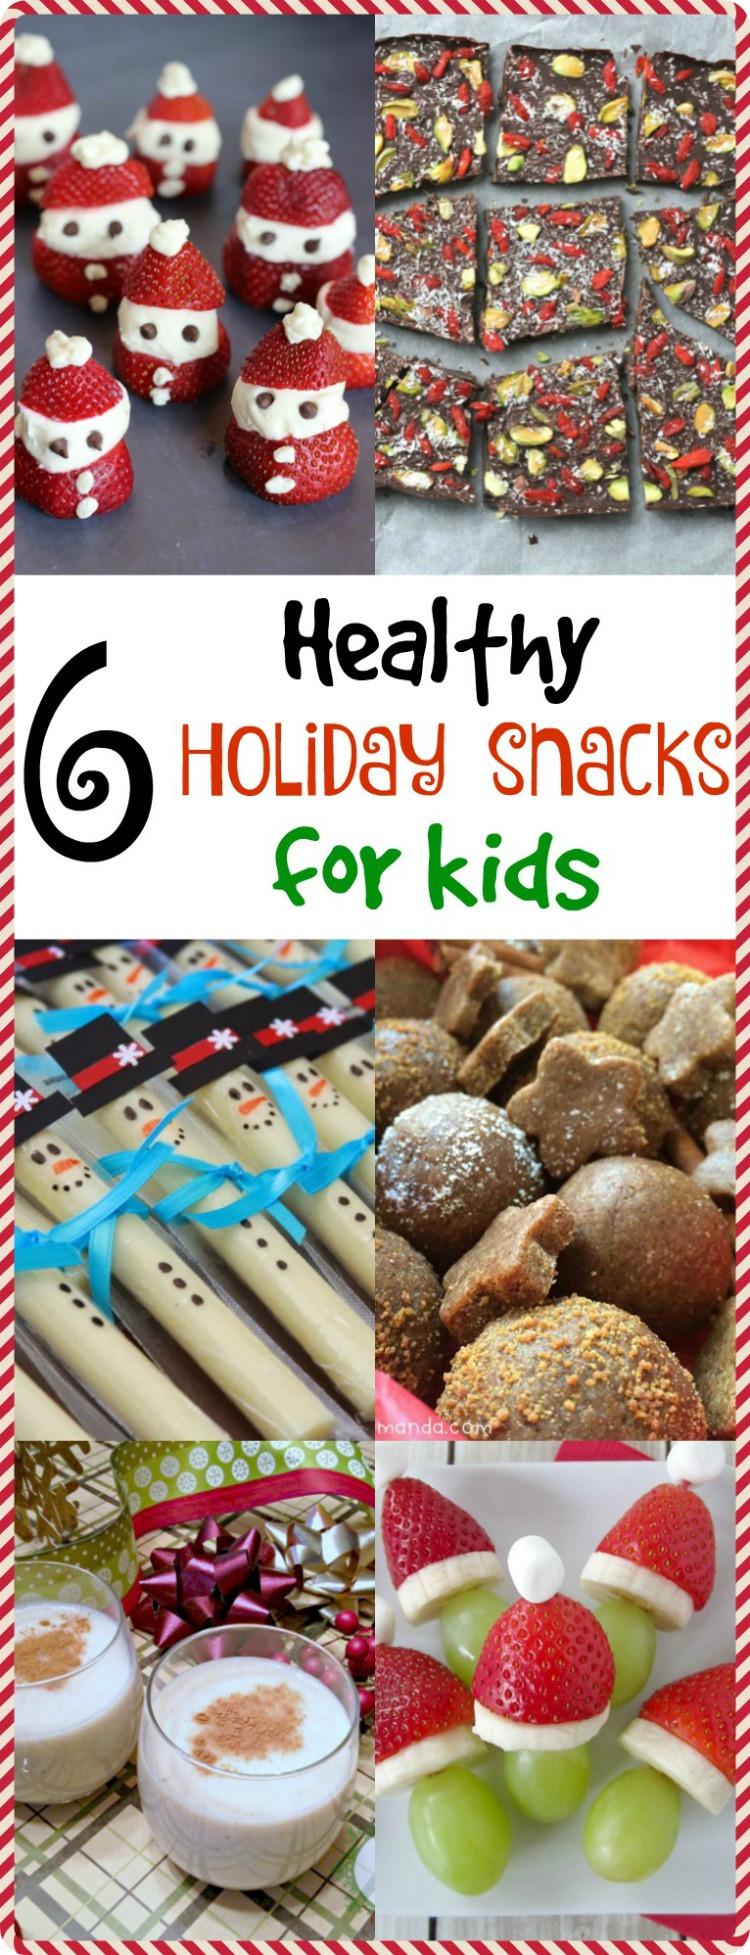 Healthy Holiday Snacks  6 Healthy Holiday Snacks for Kids MOMables